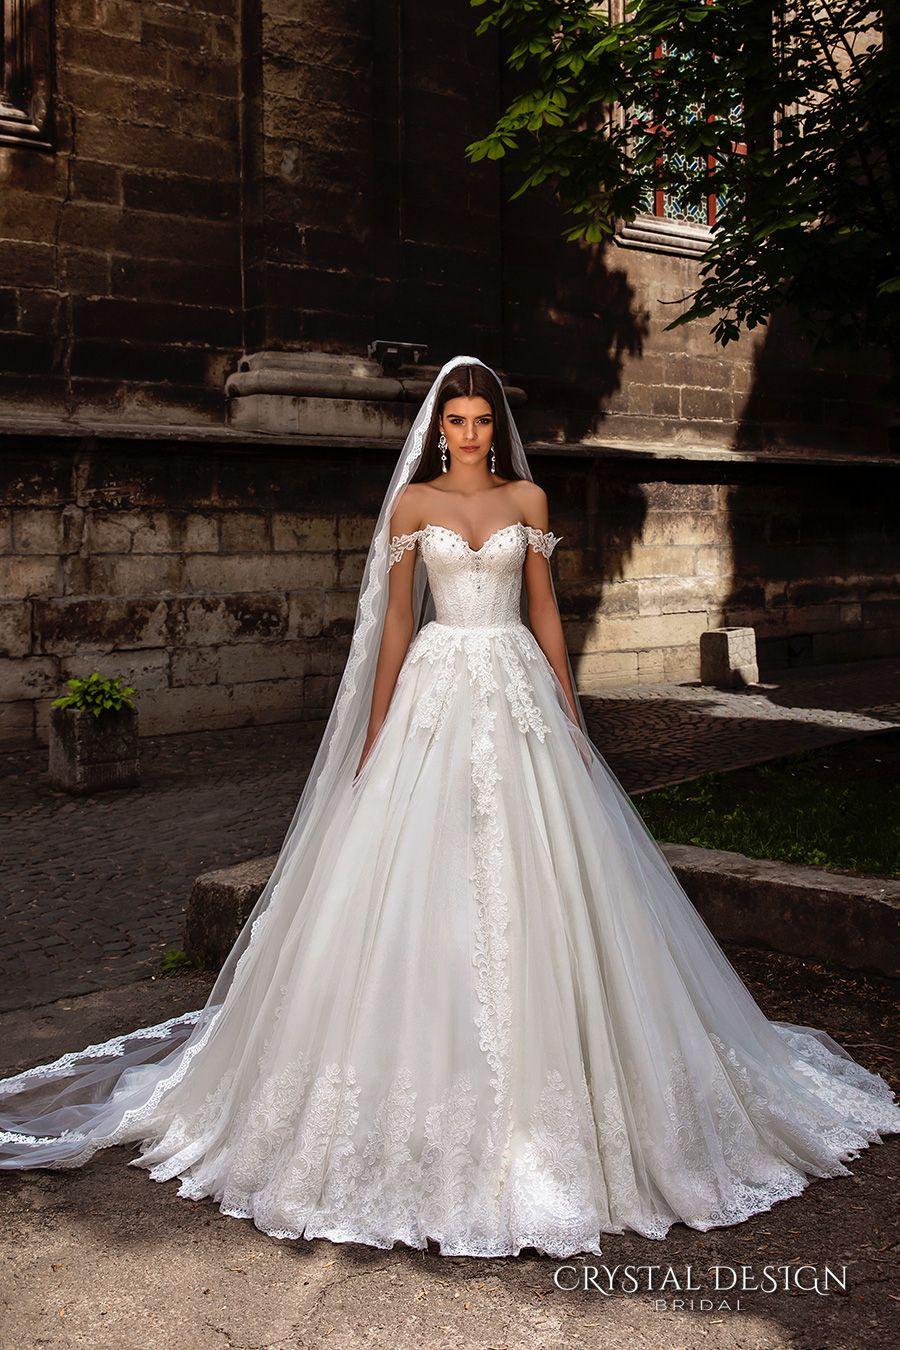 Crystal Design 2016 Wedding Dresses | Hochzeitskleid